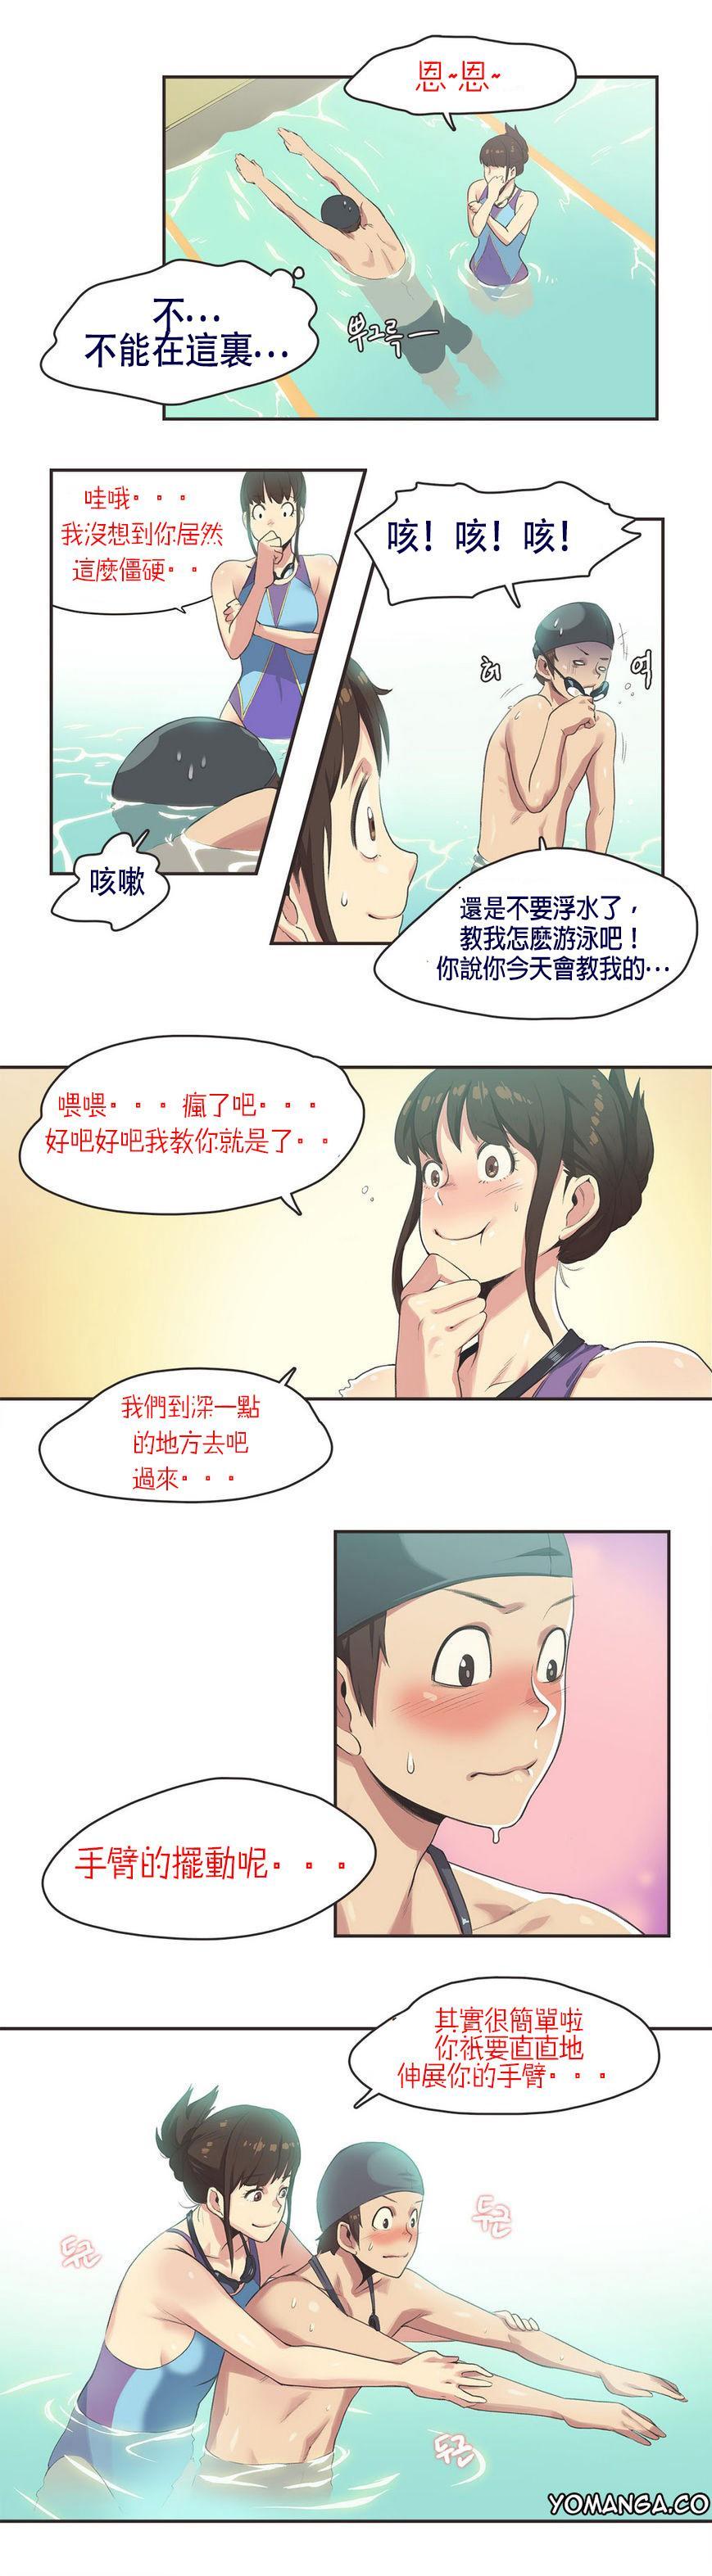 Sports Girl ch.1-11 104